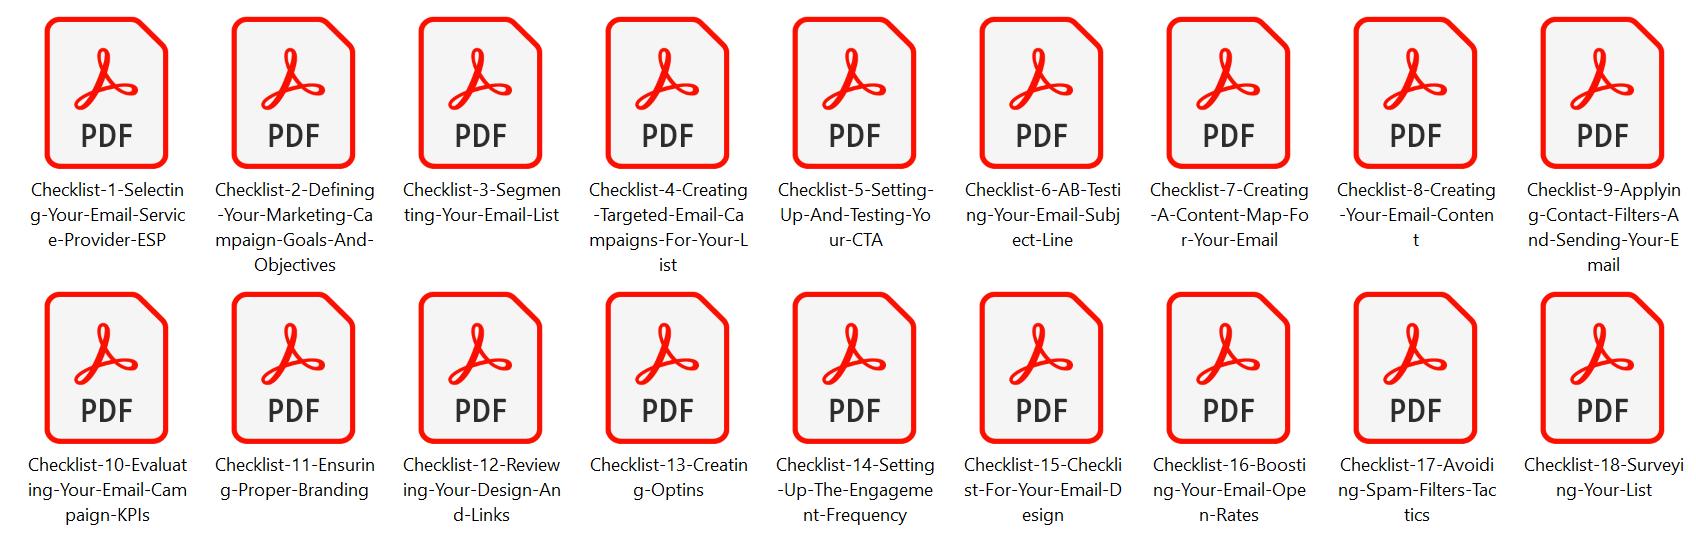 Internet Marketing Checklists List Engagement Screenshot